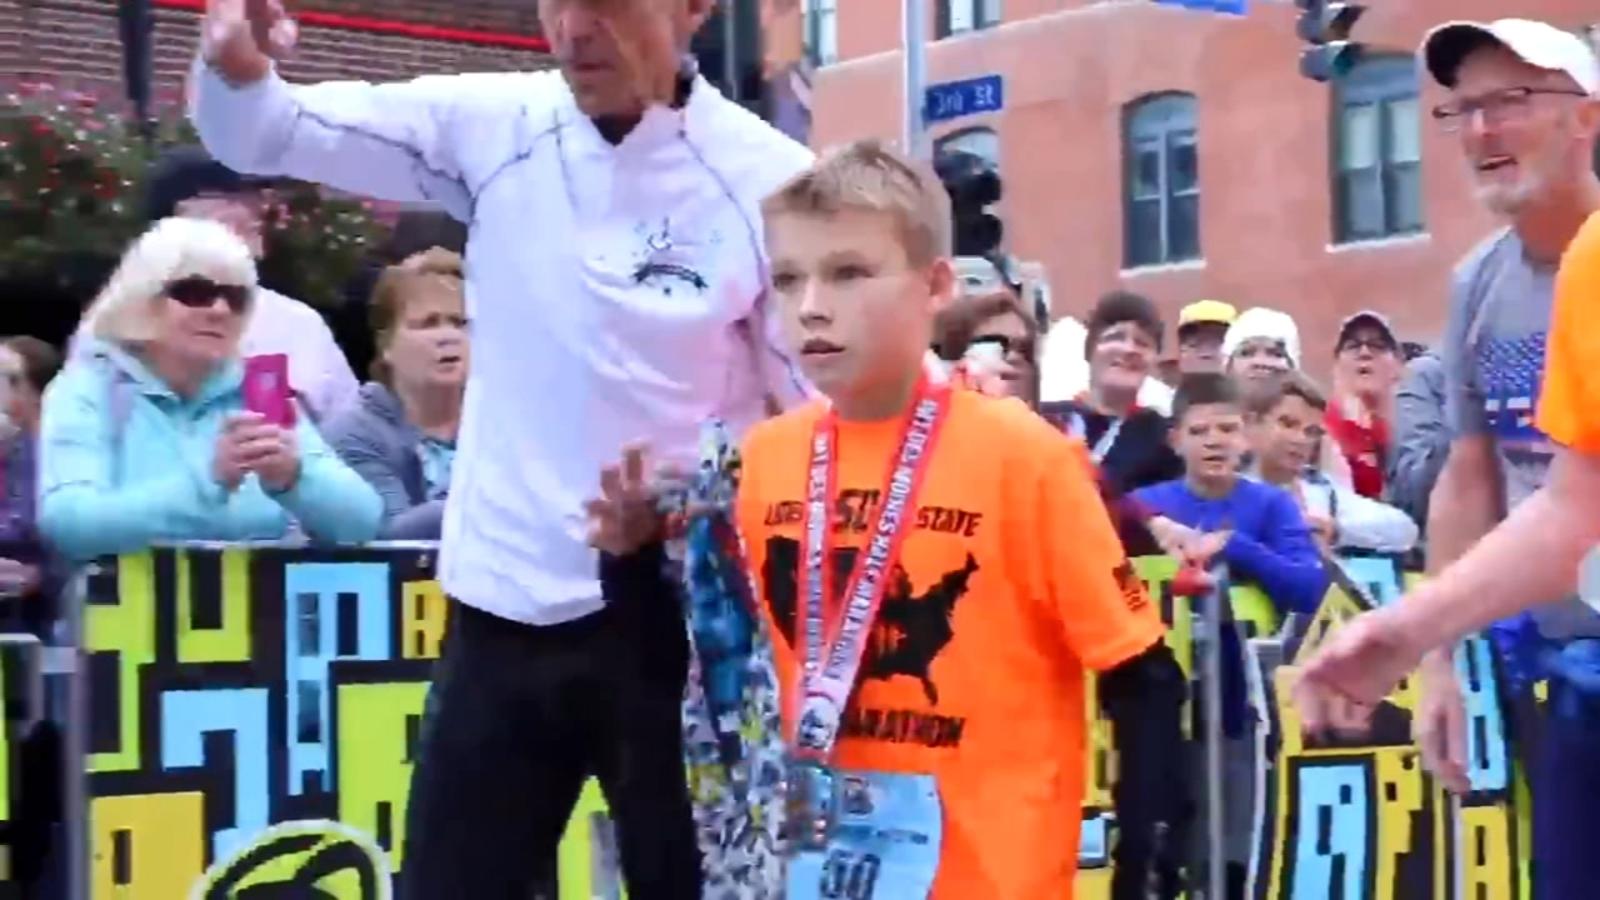 Illinois boy, 11, completes half marathon in all 50 states